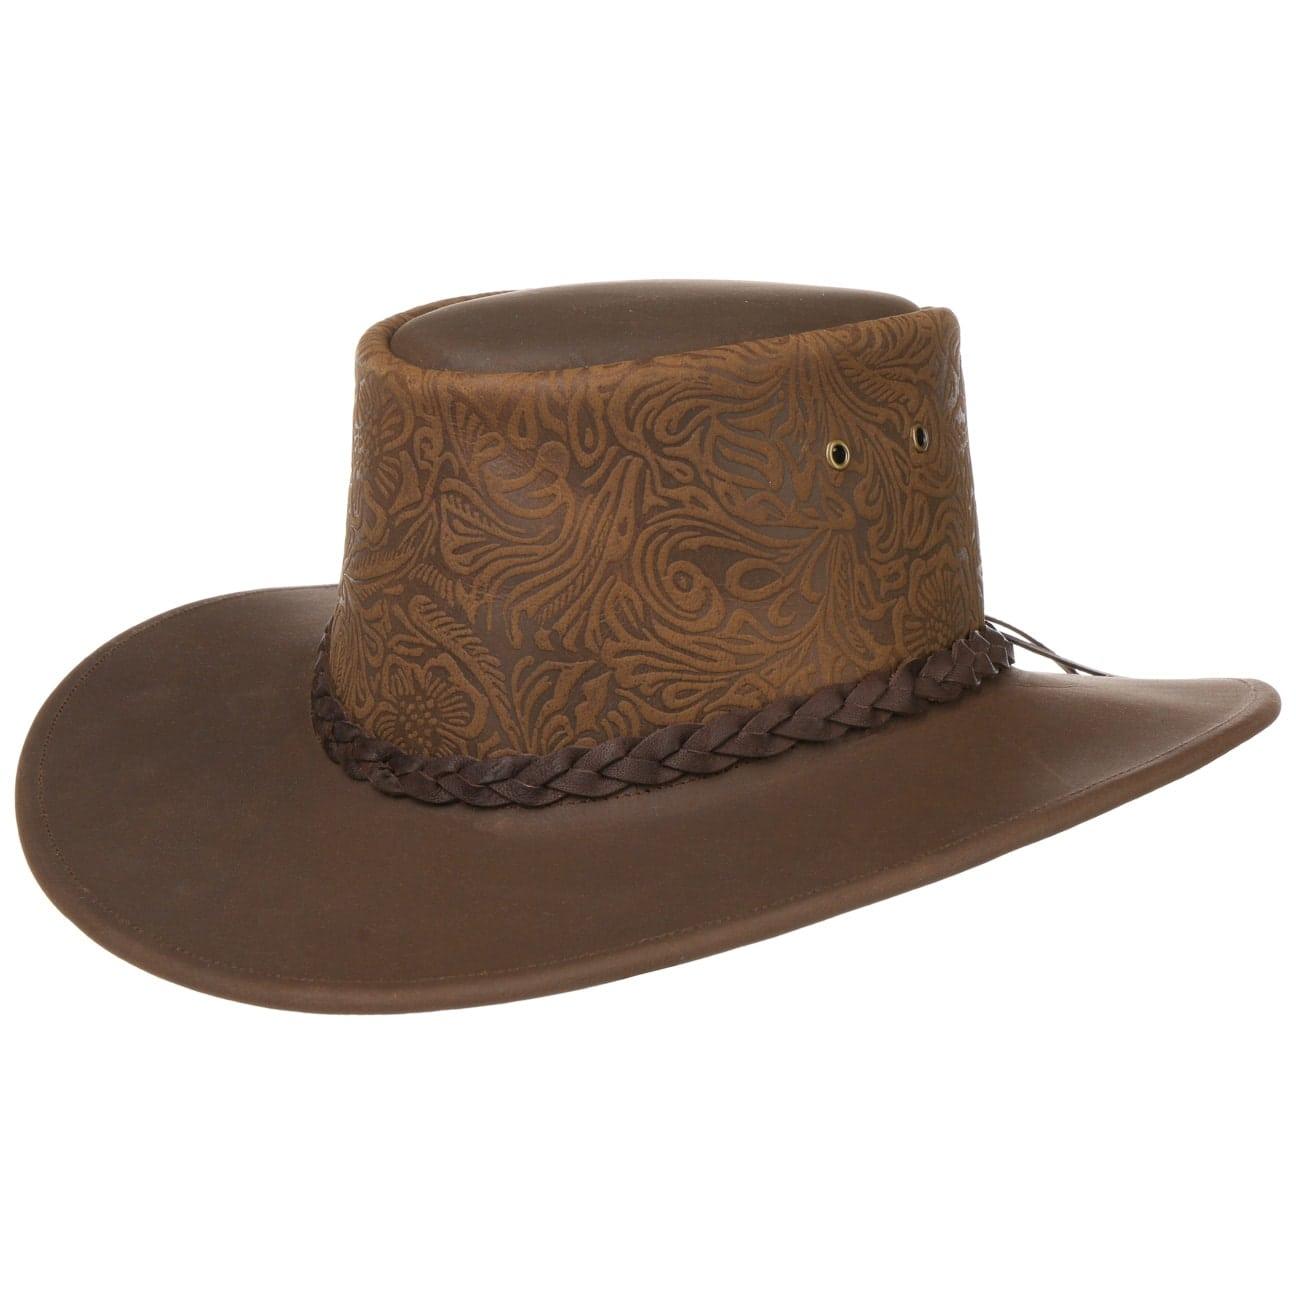 Sombrero Flowerprint by Kakadu Traders  sombrero outback